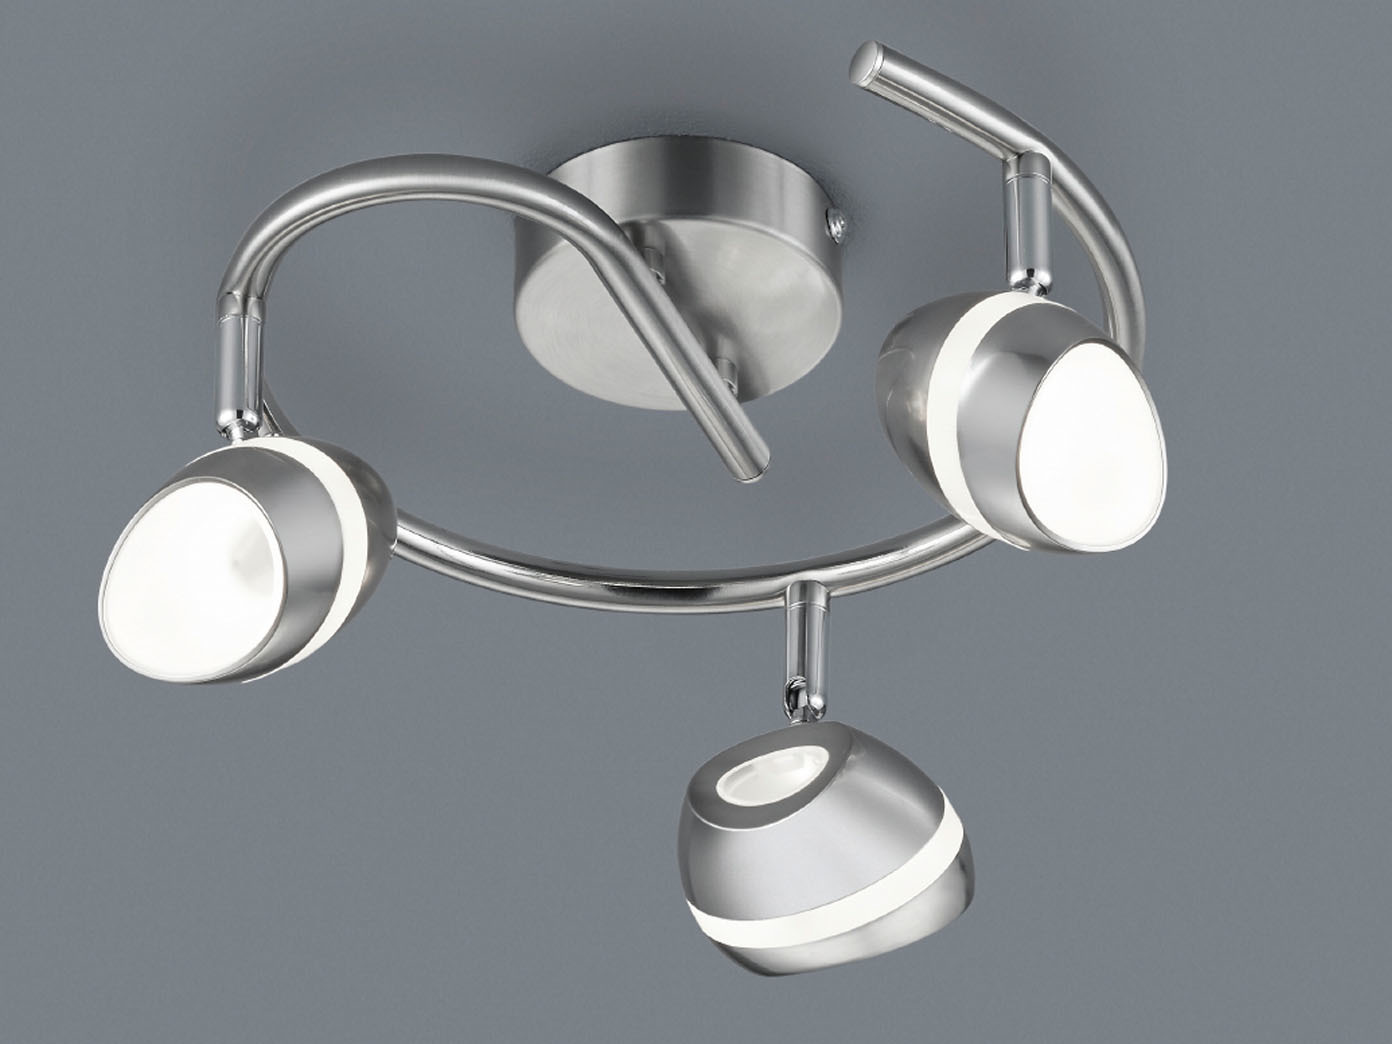 2er Set Set Set LED Deckenstrahler Rondell SHARK Spots schwenkbar, Retro Deckenlampe 9915d9